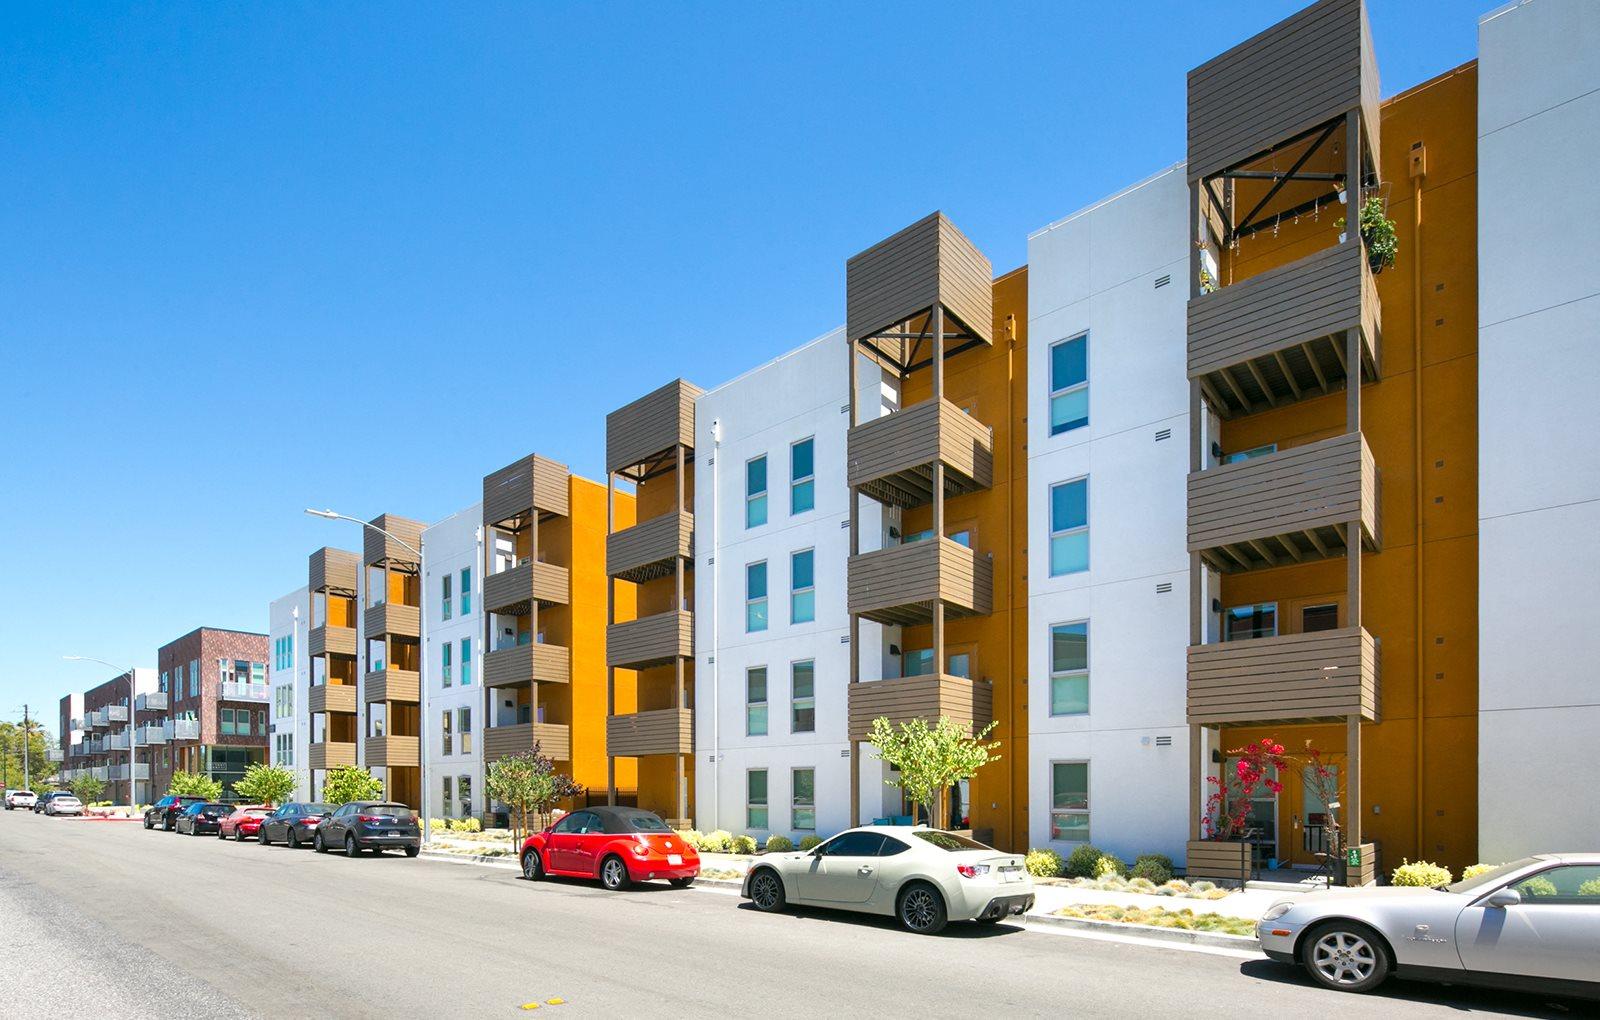 Apartments exterior white grey orange paint streetside